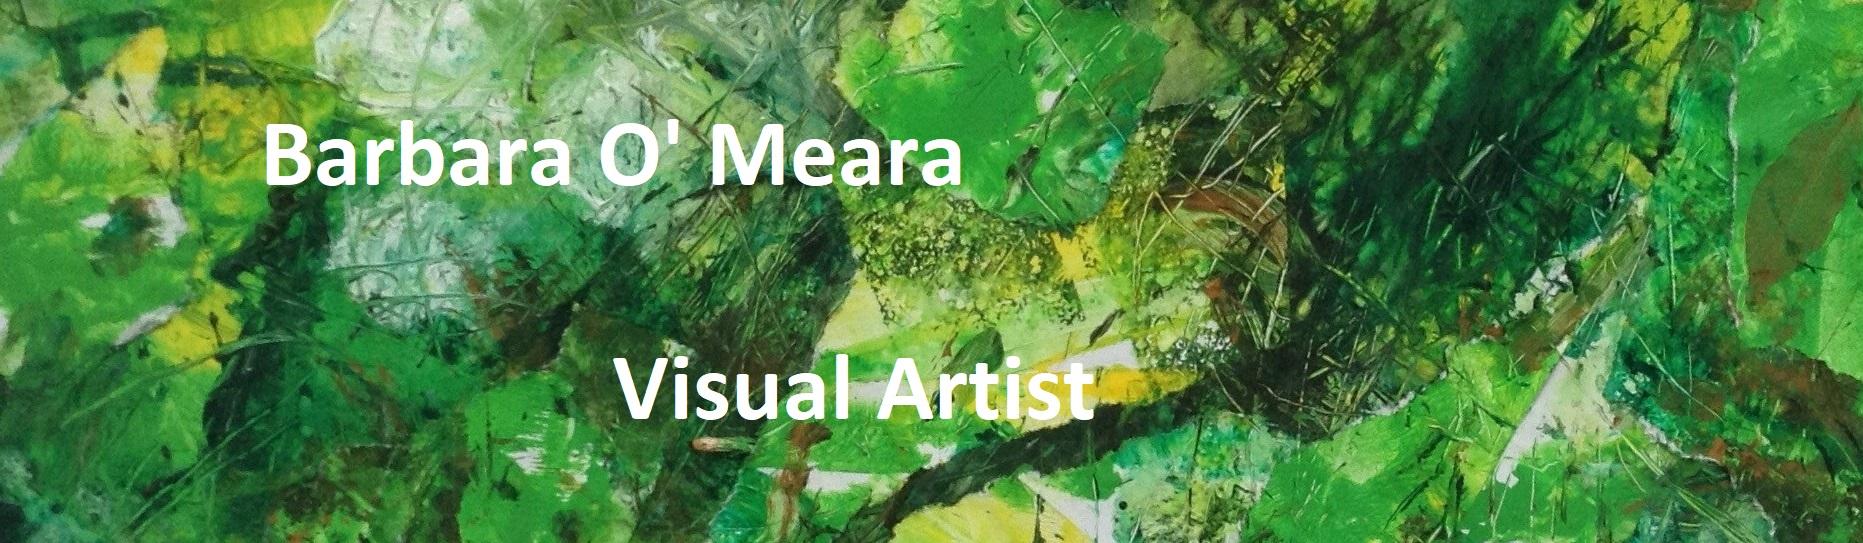 Barbara O' Meara Artist